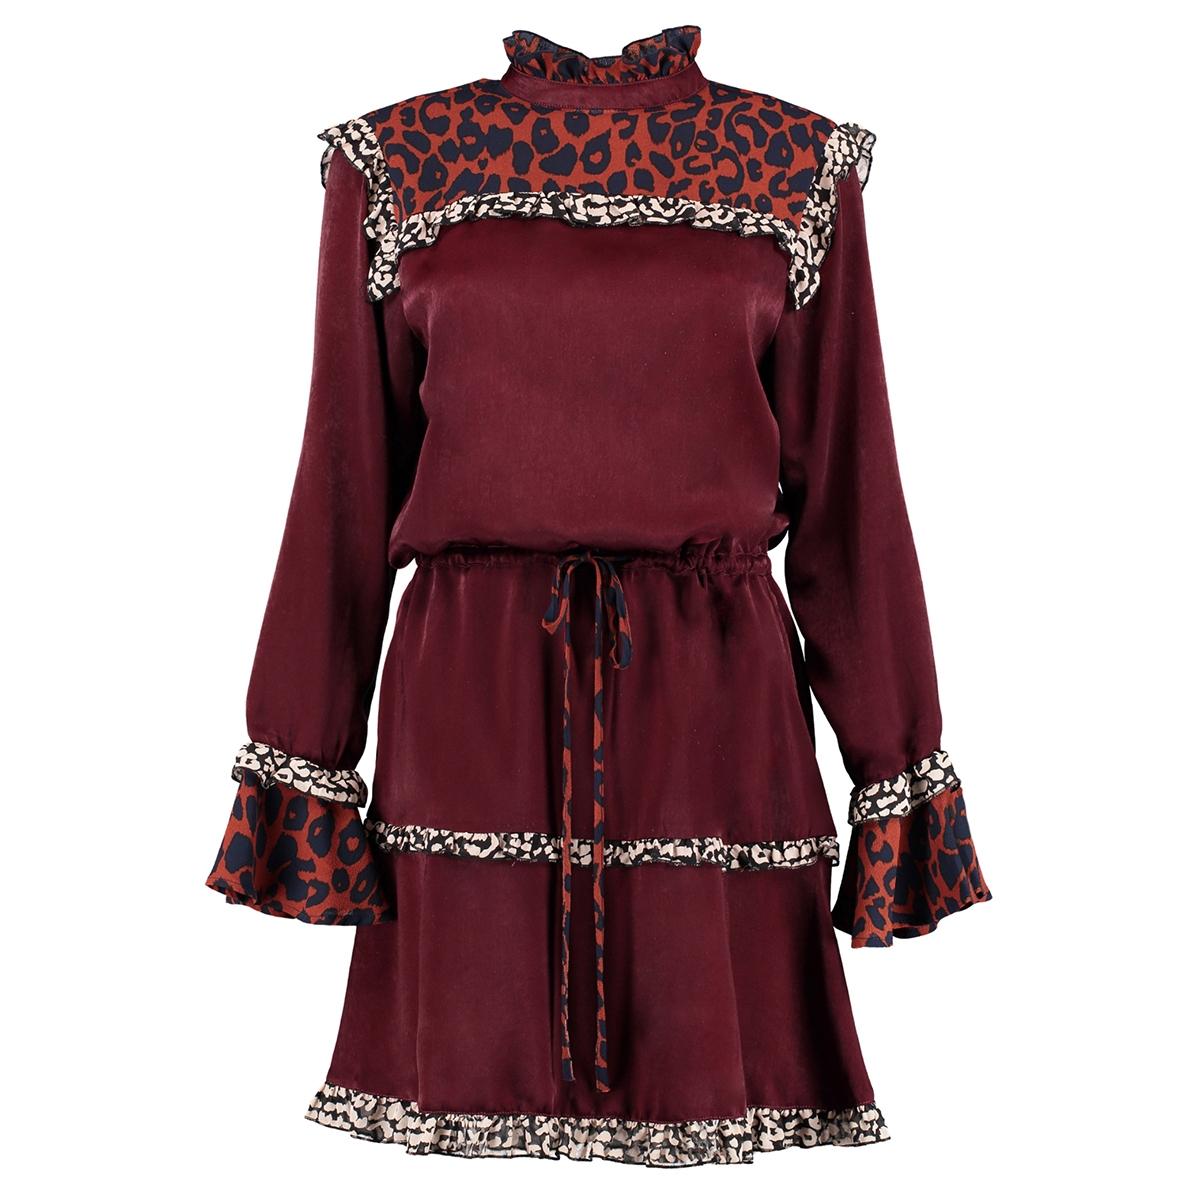 fw18x905 harper & yve jurk bordeaux